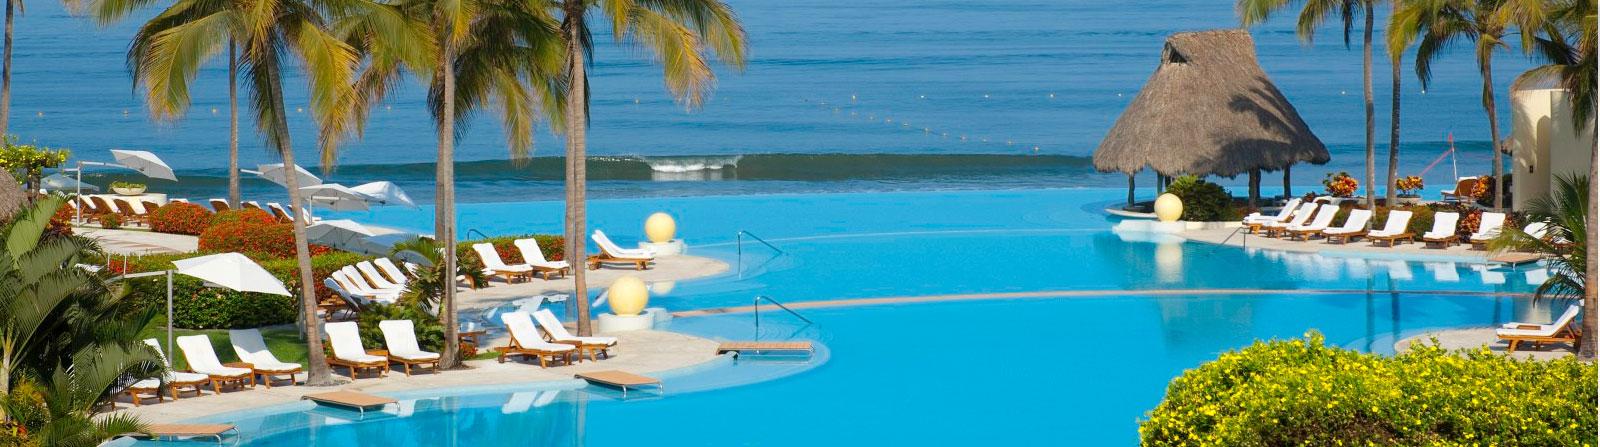 Grand Velas Riviera Nayarit Destinations Mexico